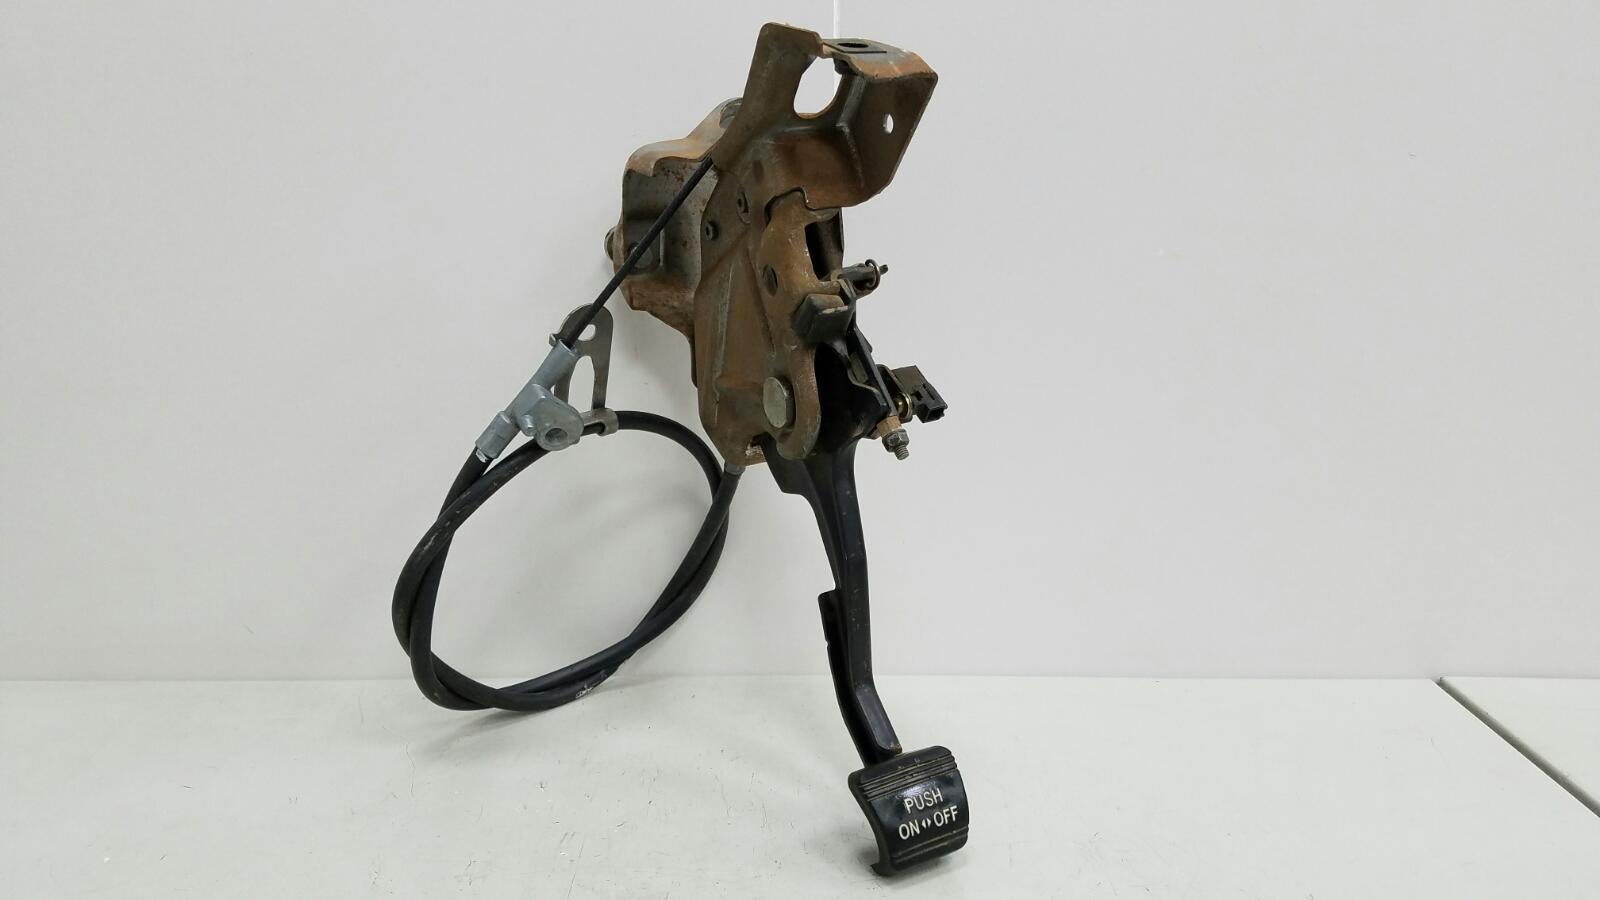 Педаль стояночного тормоза ножник Toyota Prius XW10 1NZ-FXE 1998г